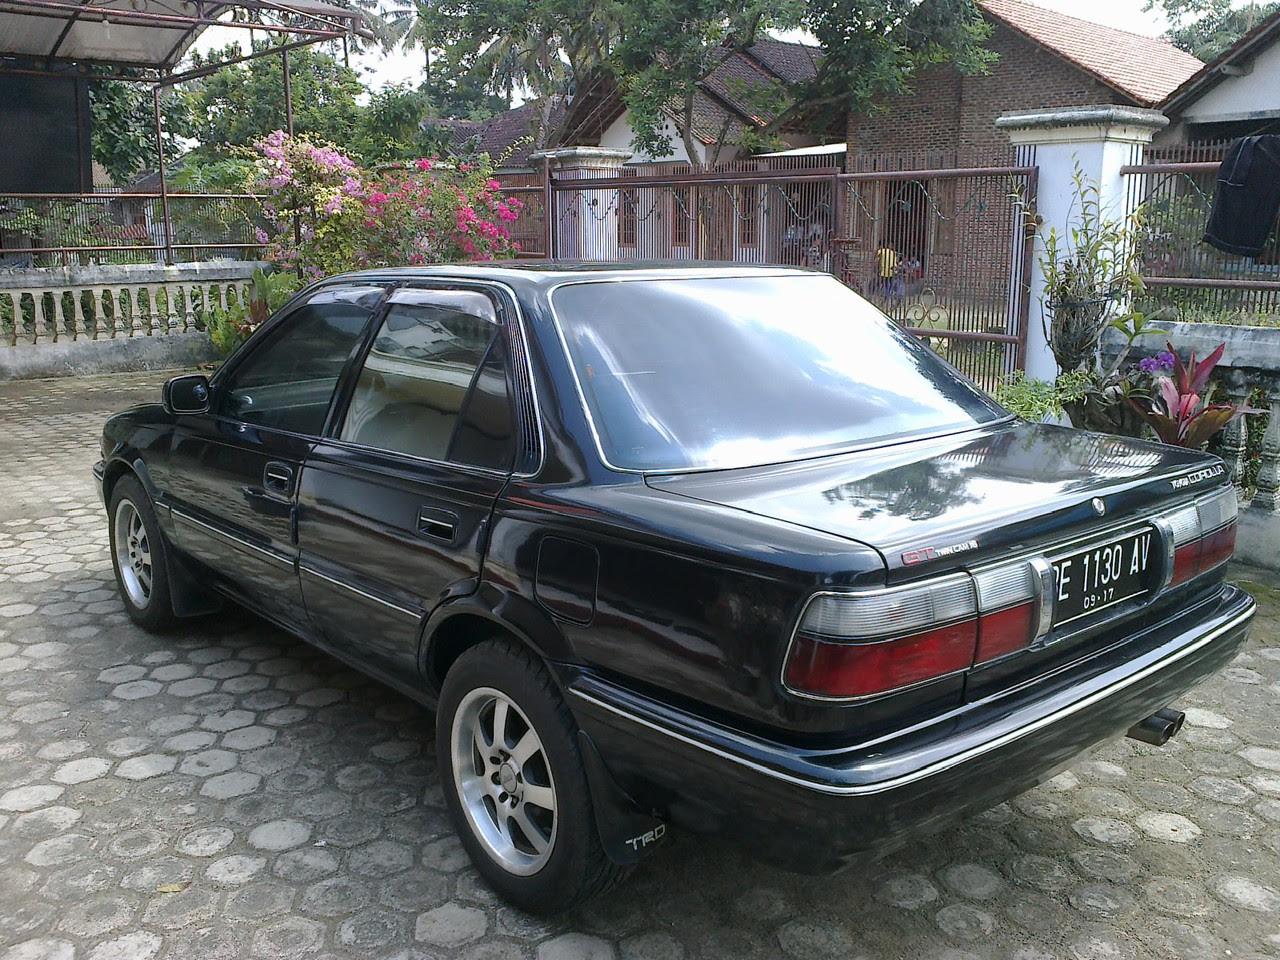 Bekas Corolla Twincam GTi Tahun 1991 Lampung